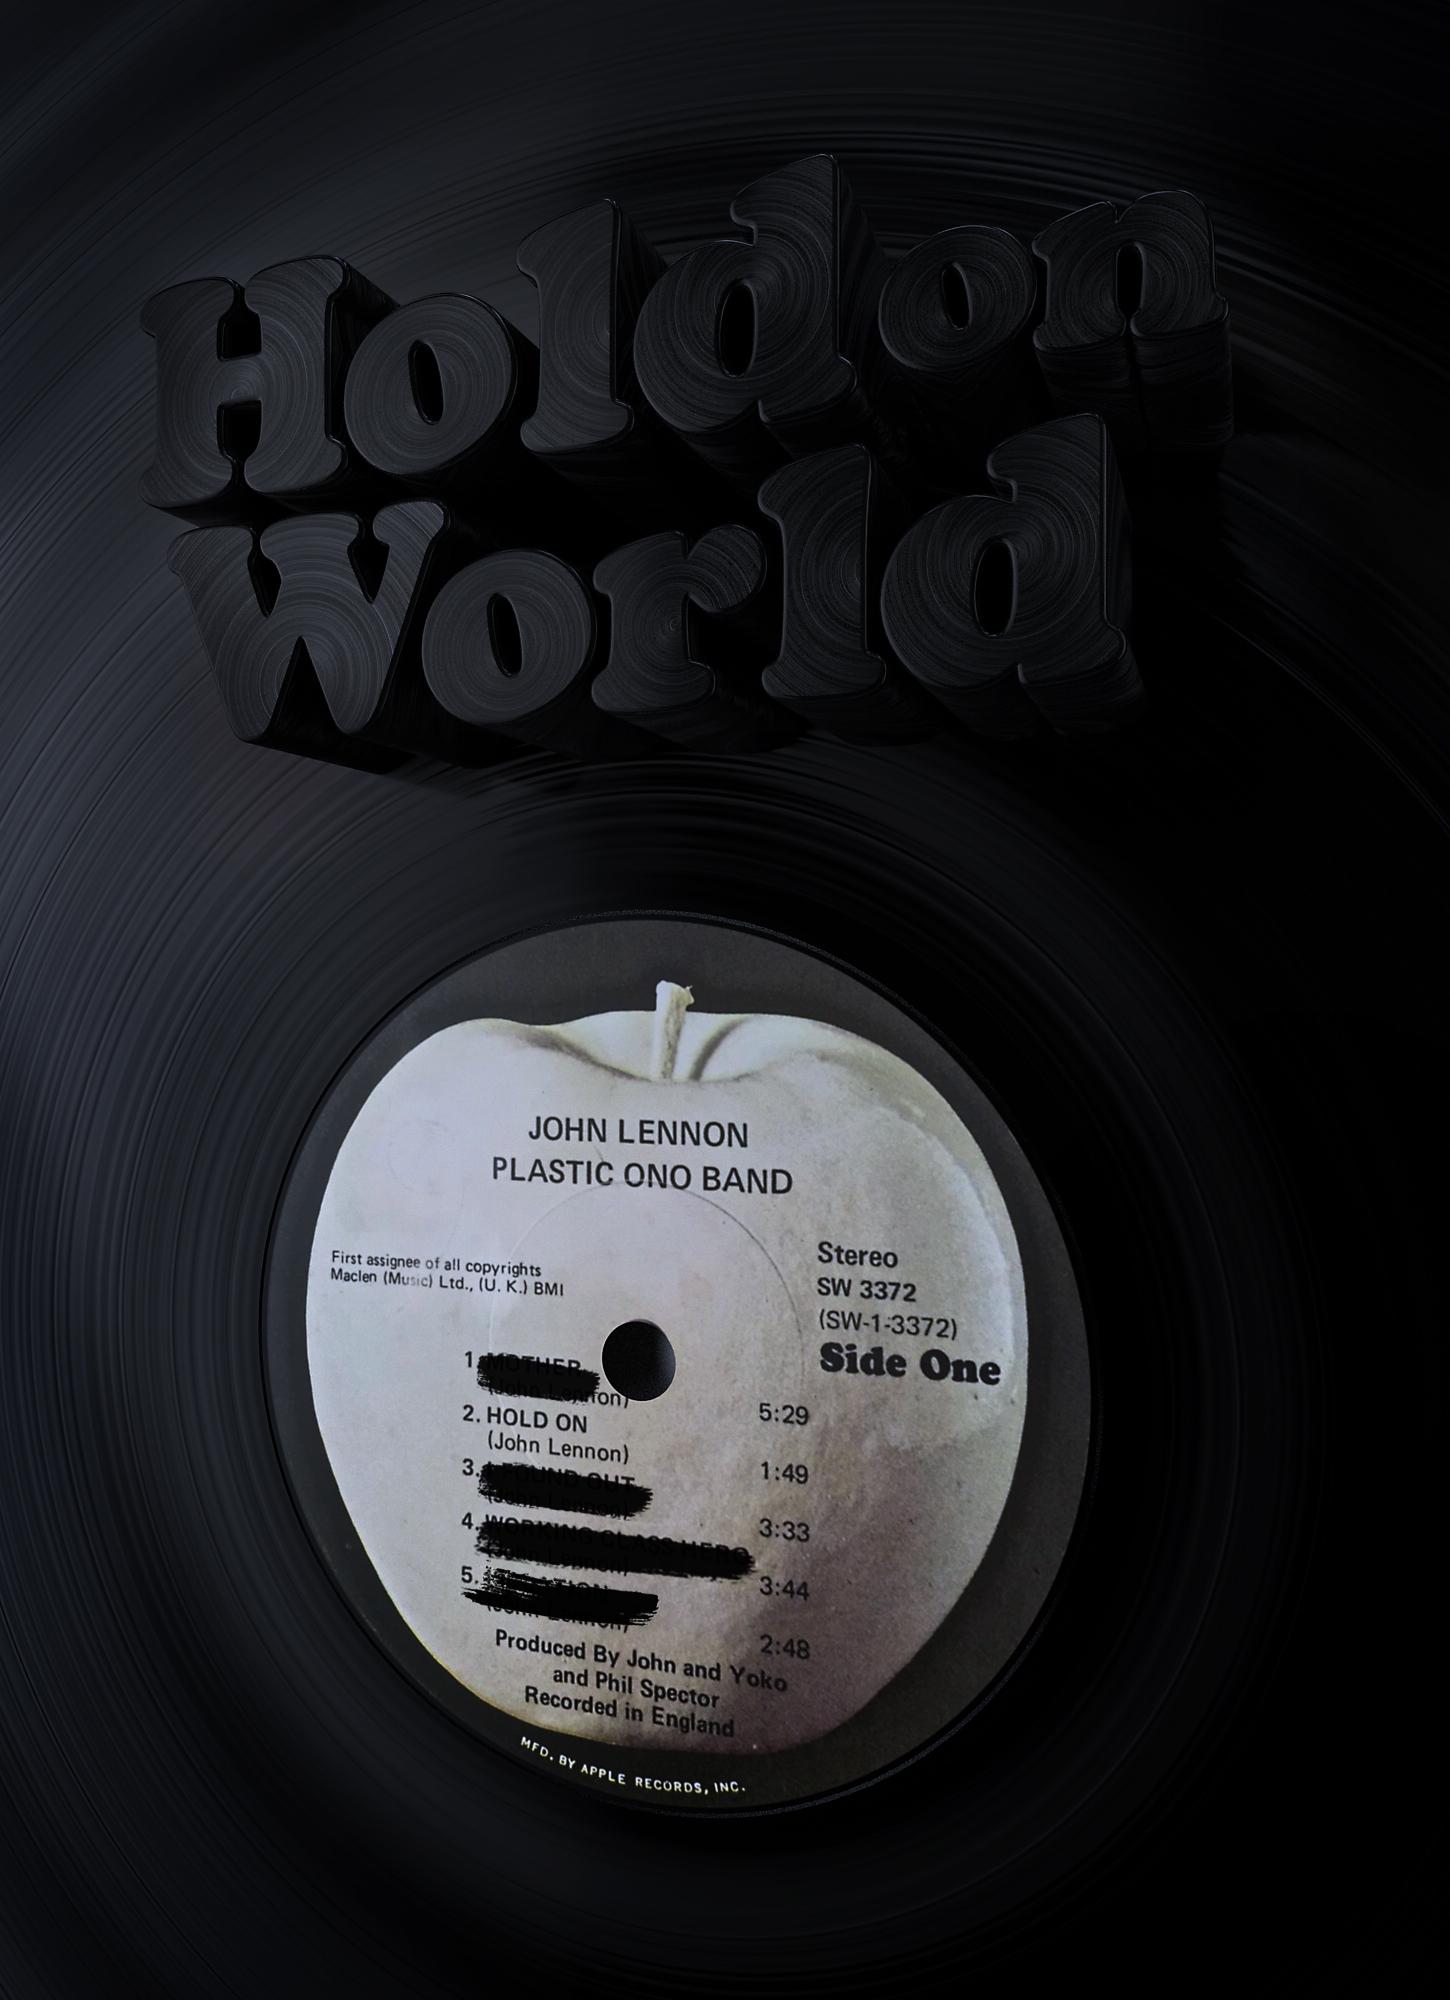 Type_and_songs_Hold_on_John_Lennon